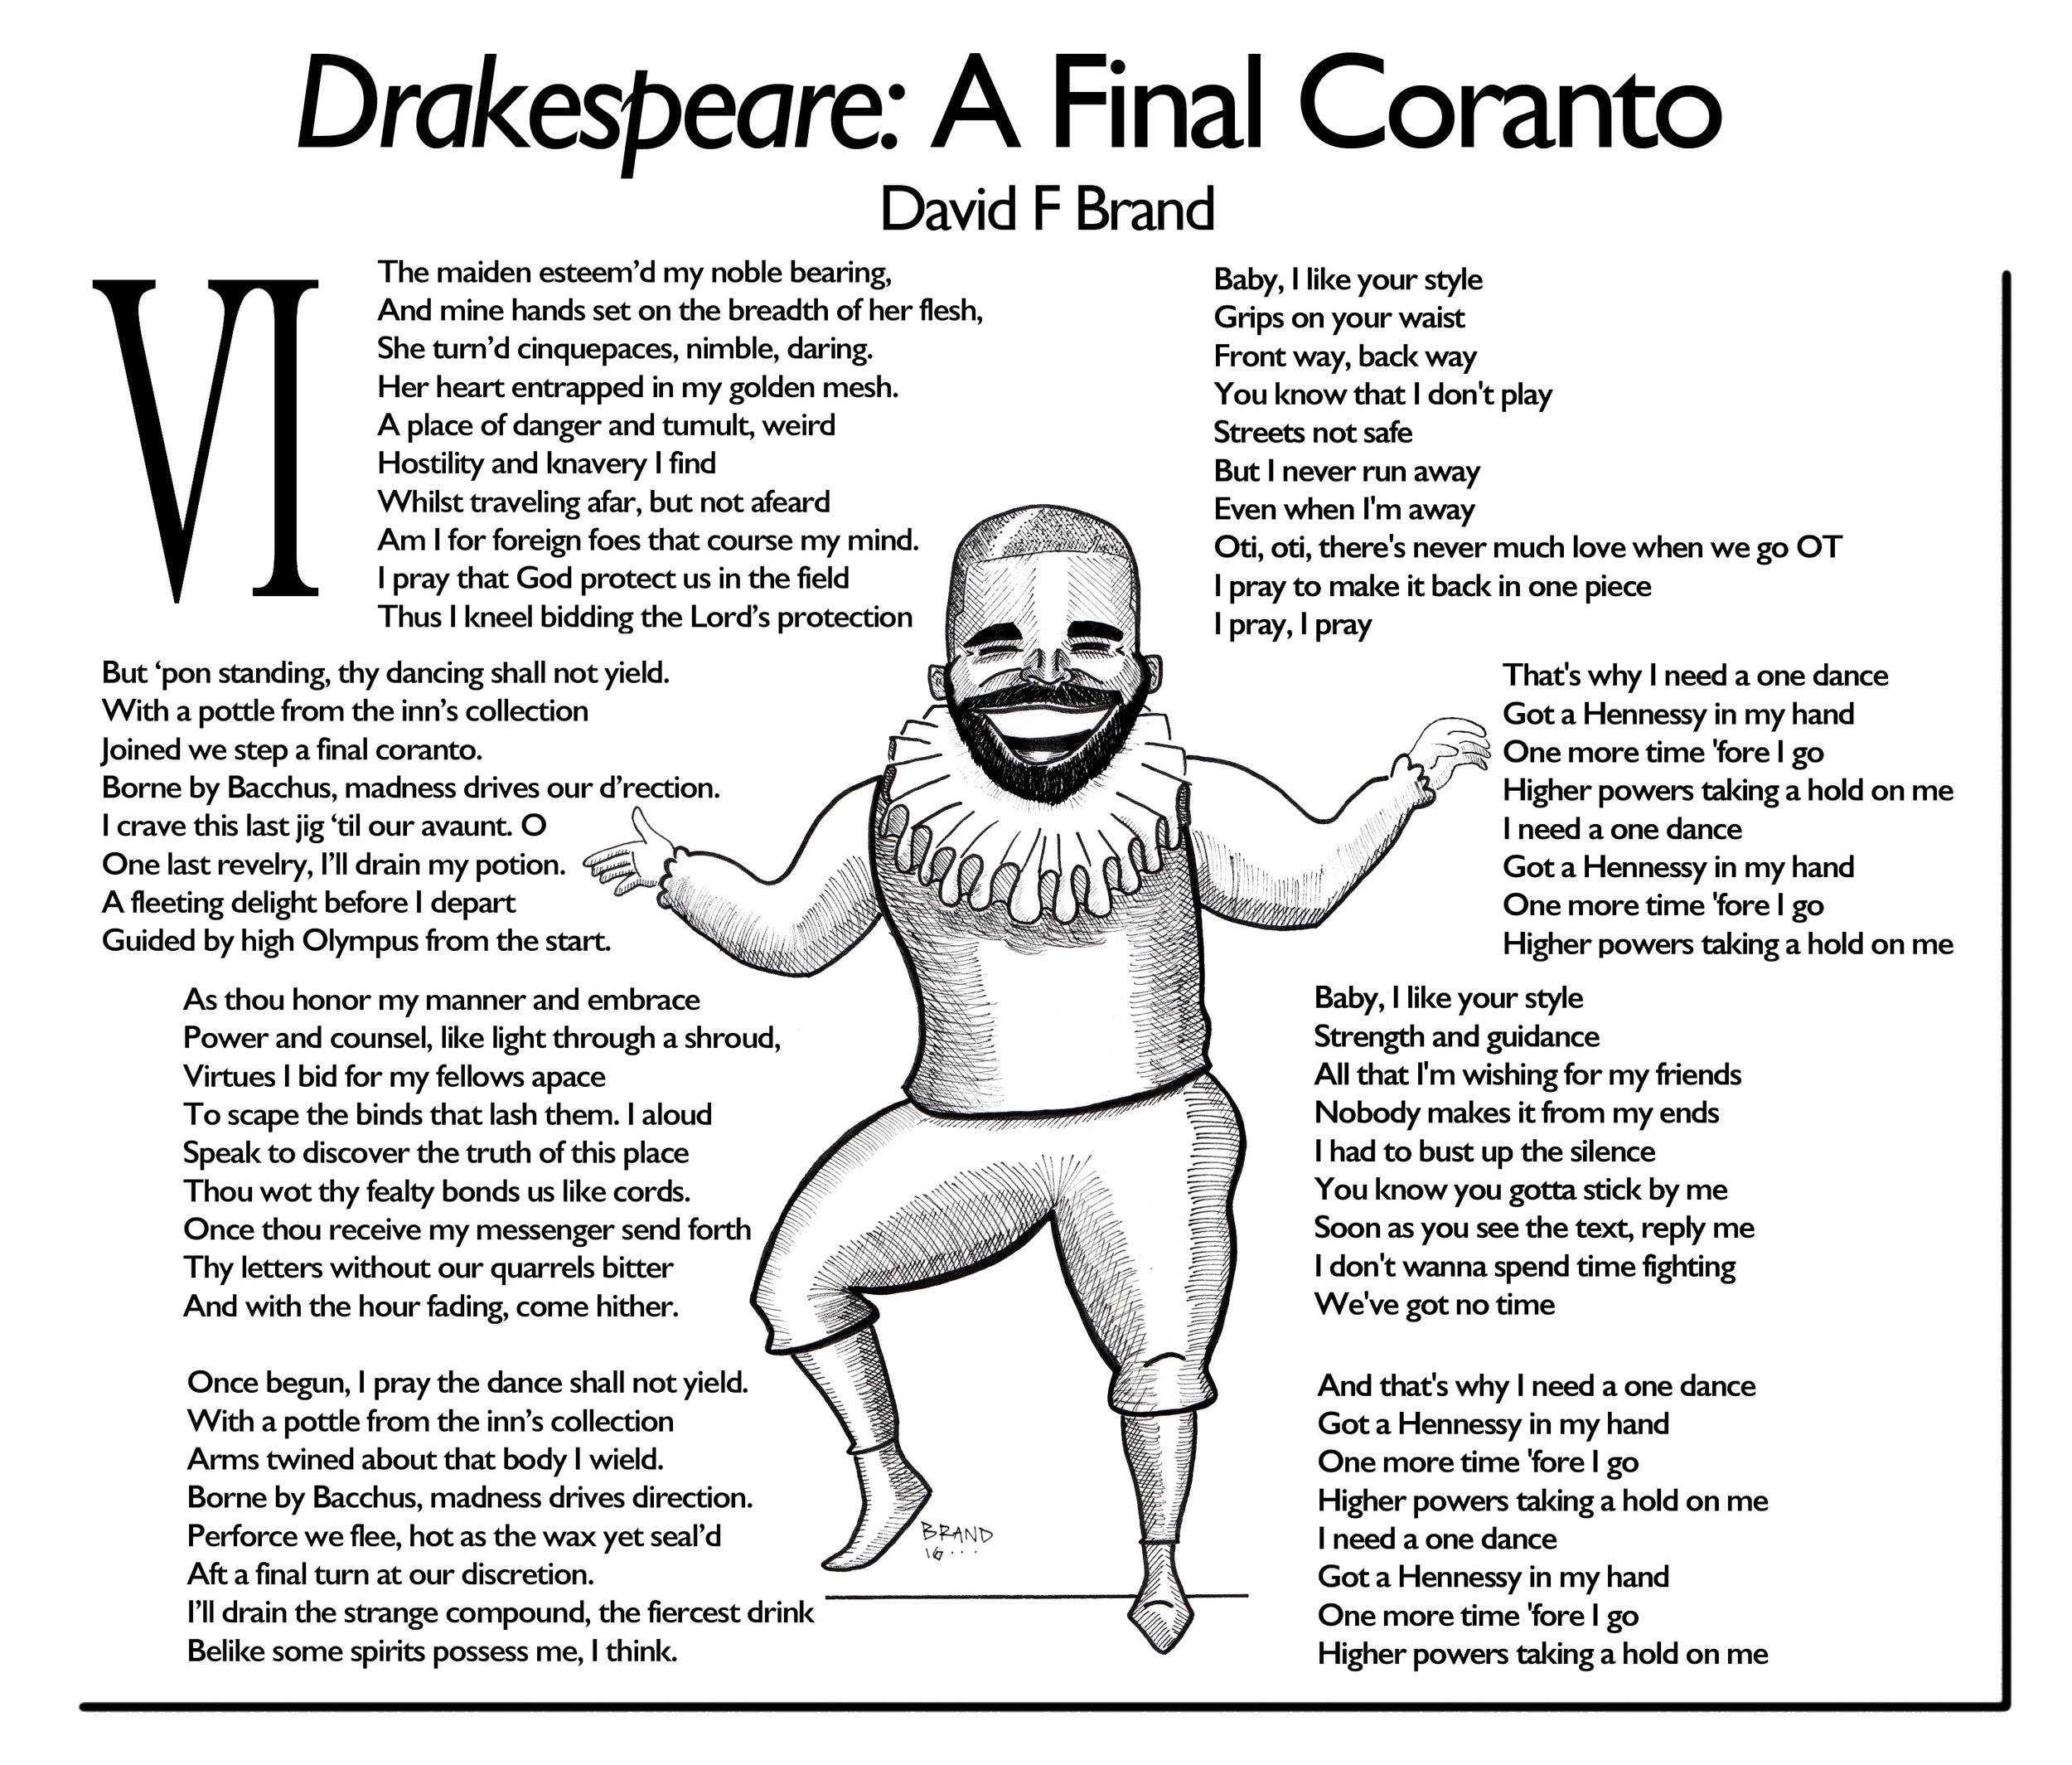 Drakespeare - A Final Coranto